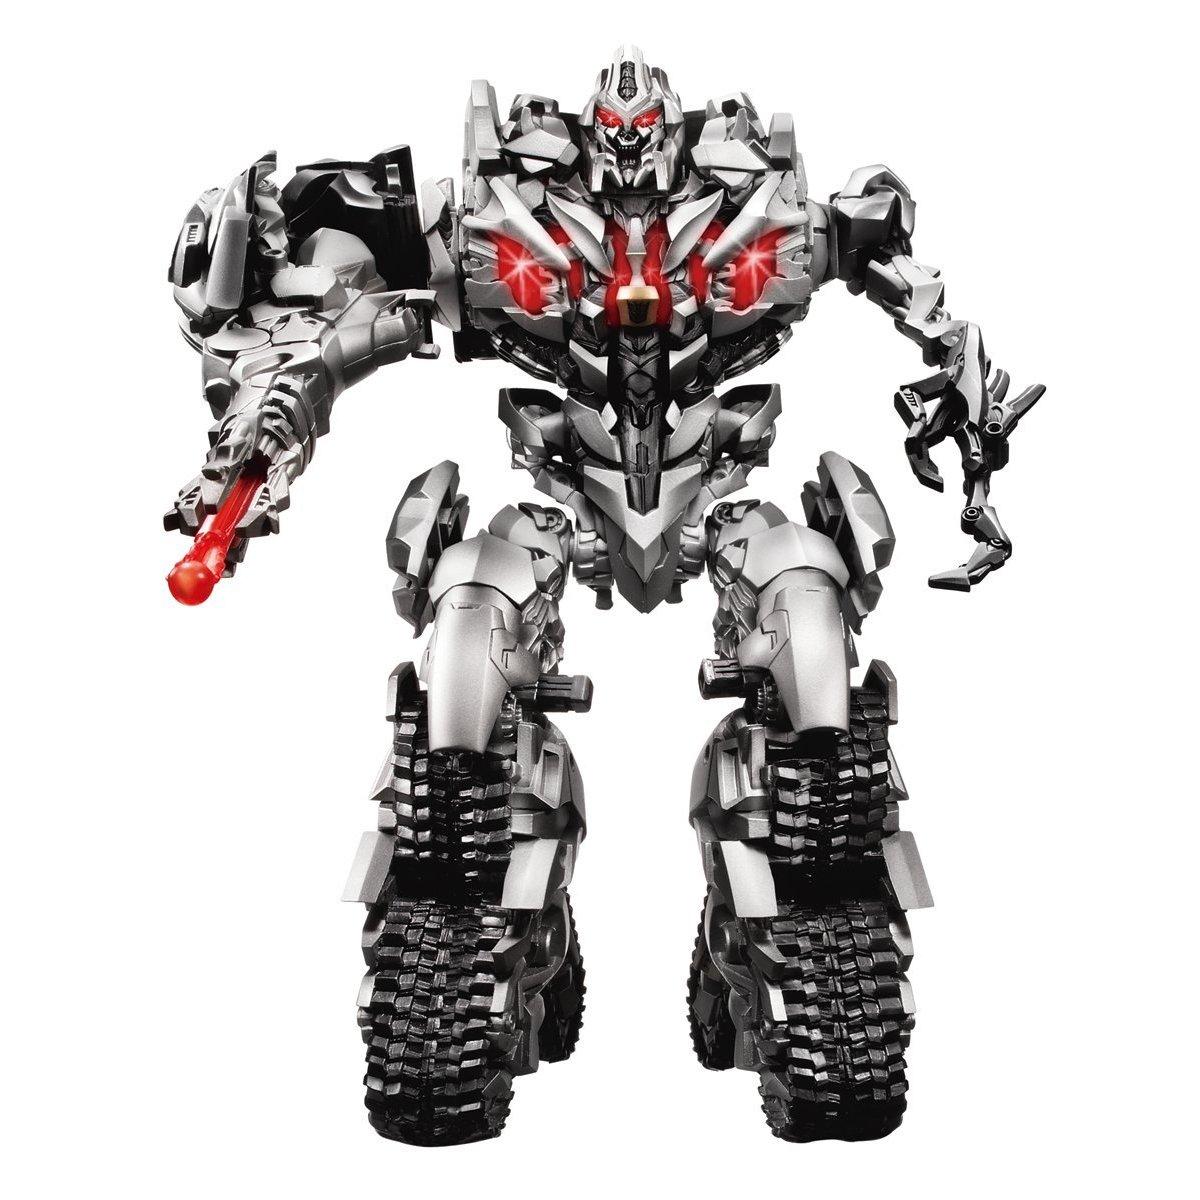 Transformers Revenge Of The Fallen Megatron Toys 18